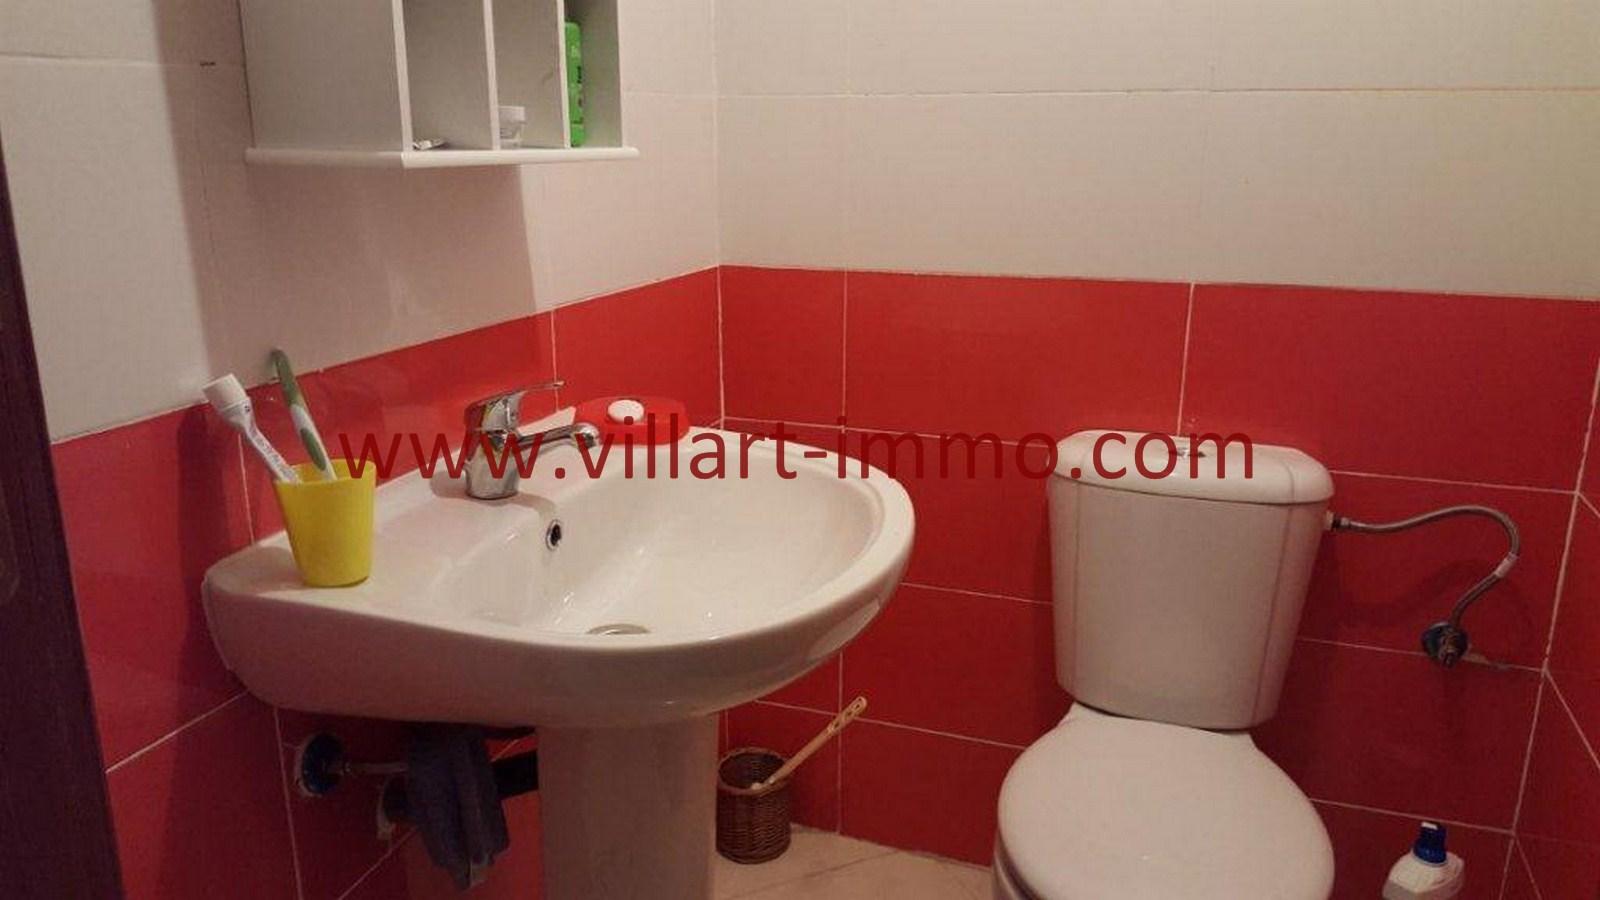 7-Vente-Appartement-Tanger-Toilette de service-VA509-Villart Immo